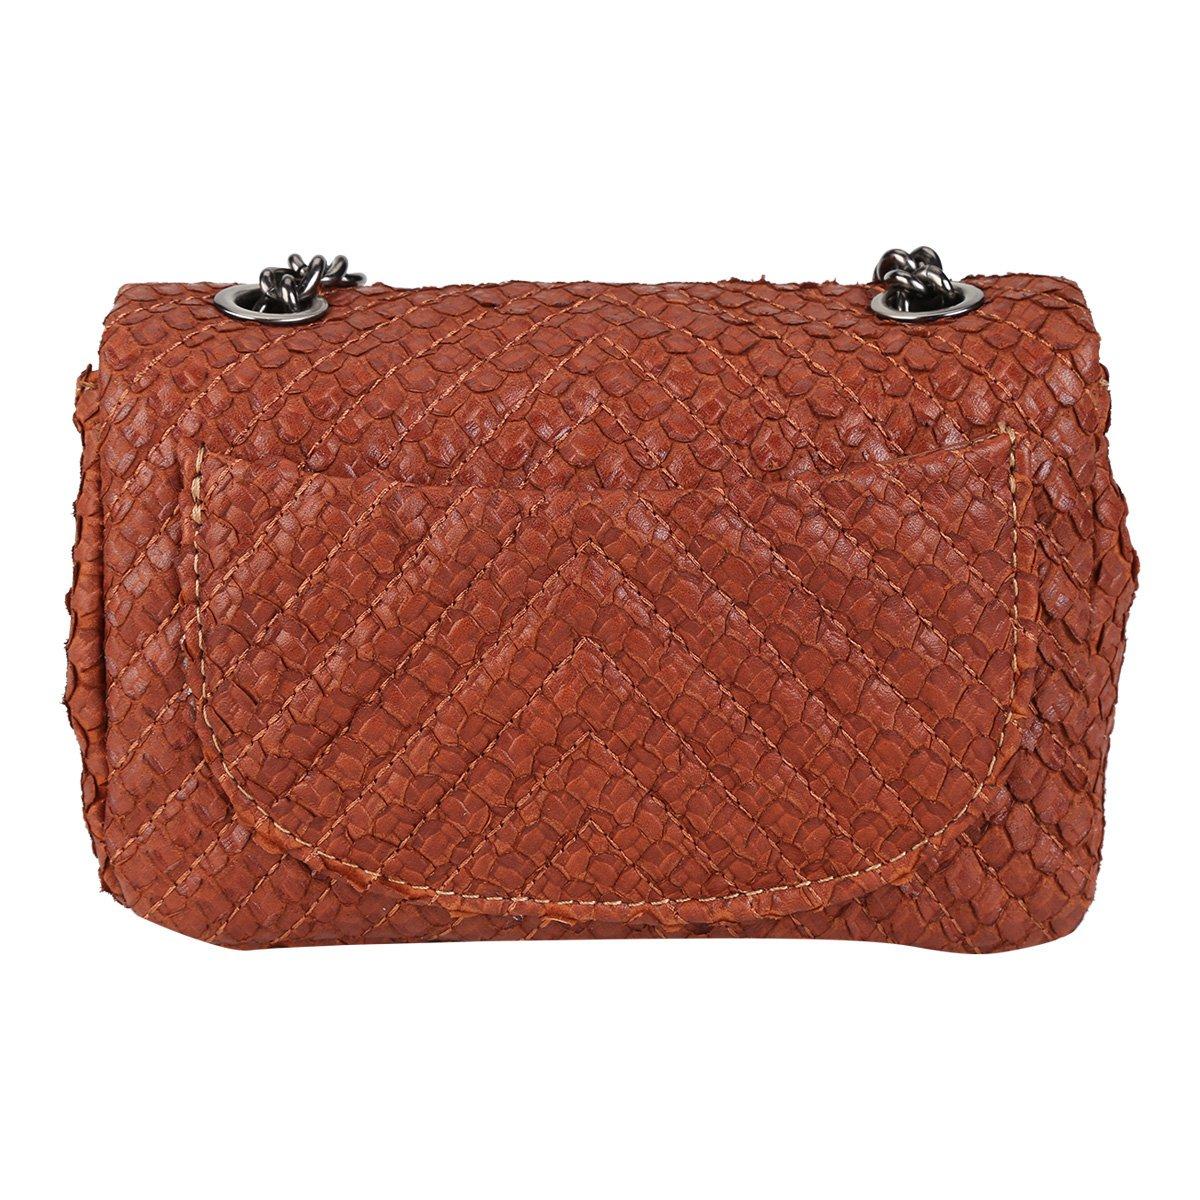 Bolsa Bag Couro Caramelo Caseina Serpente Couro Bolsa Dumond Mini Feminina pwRpxdqX